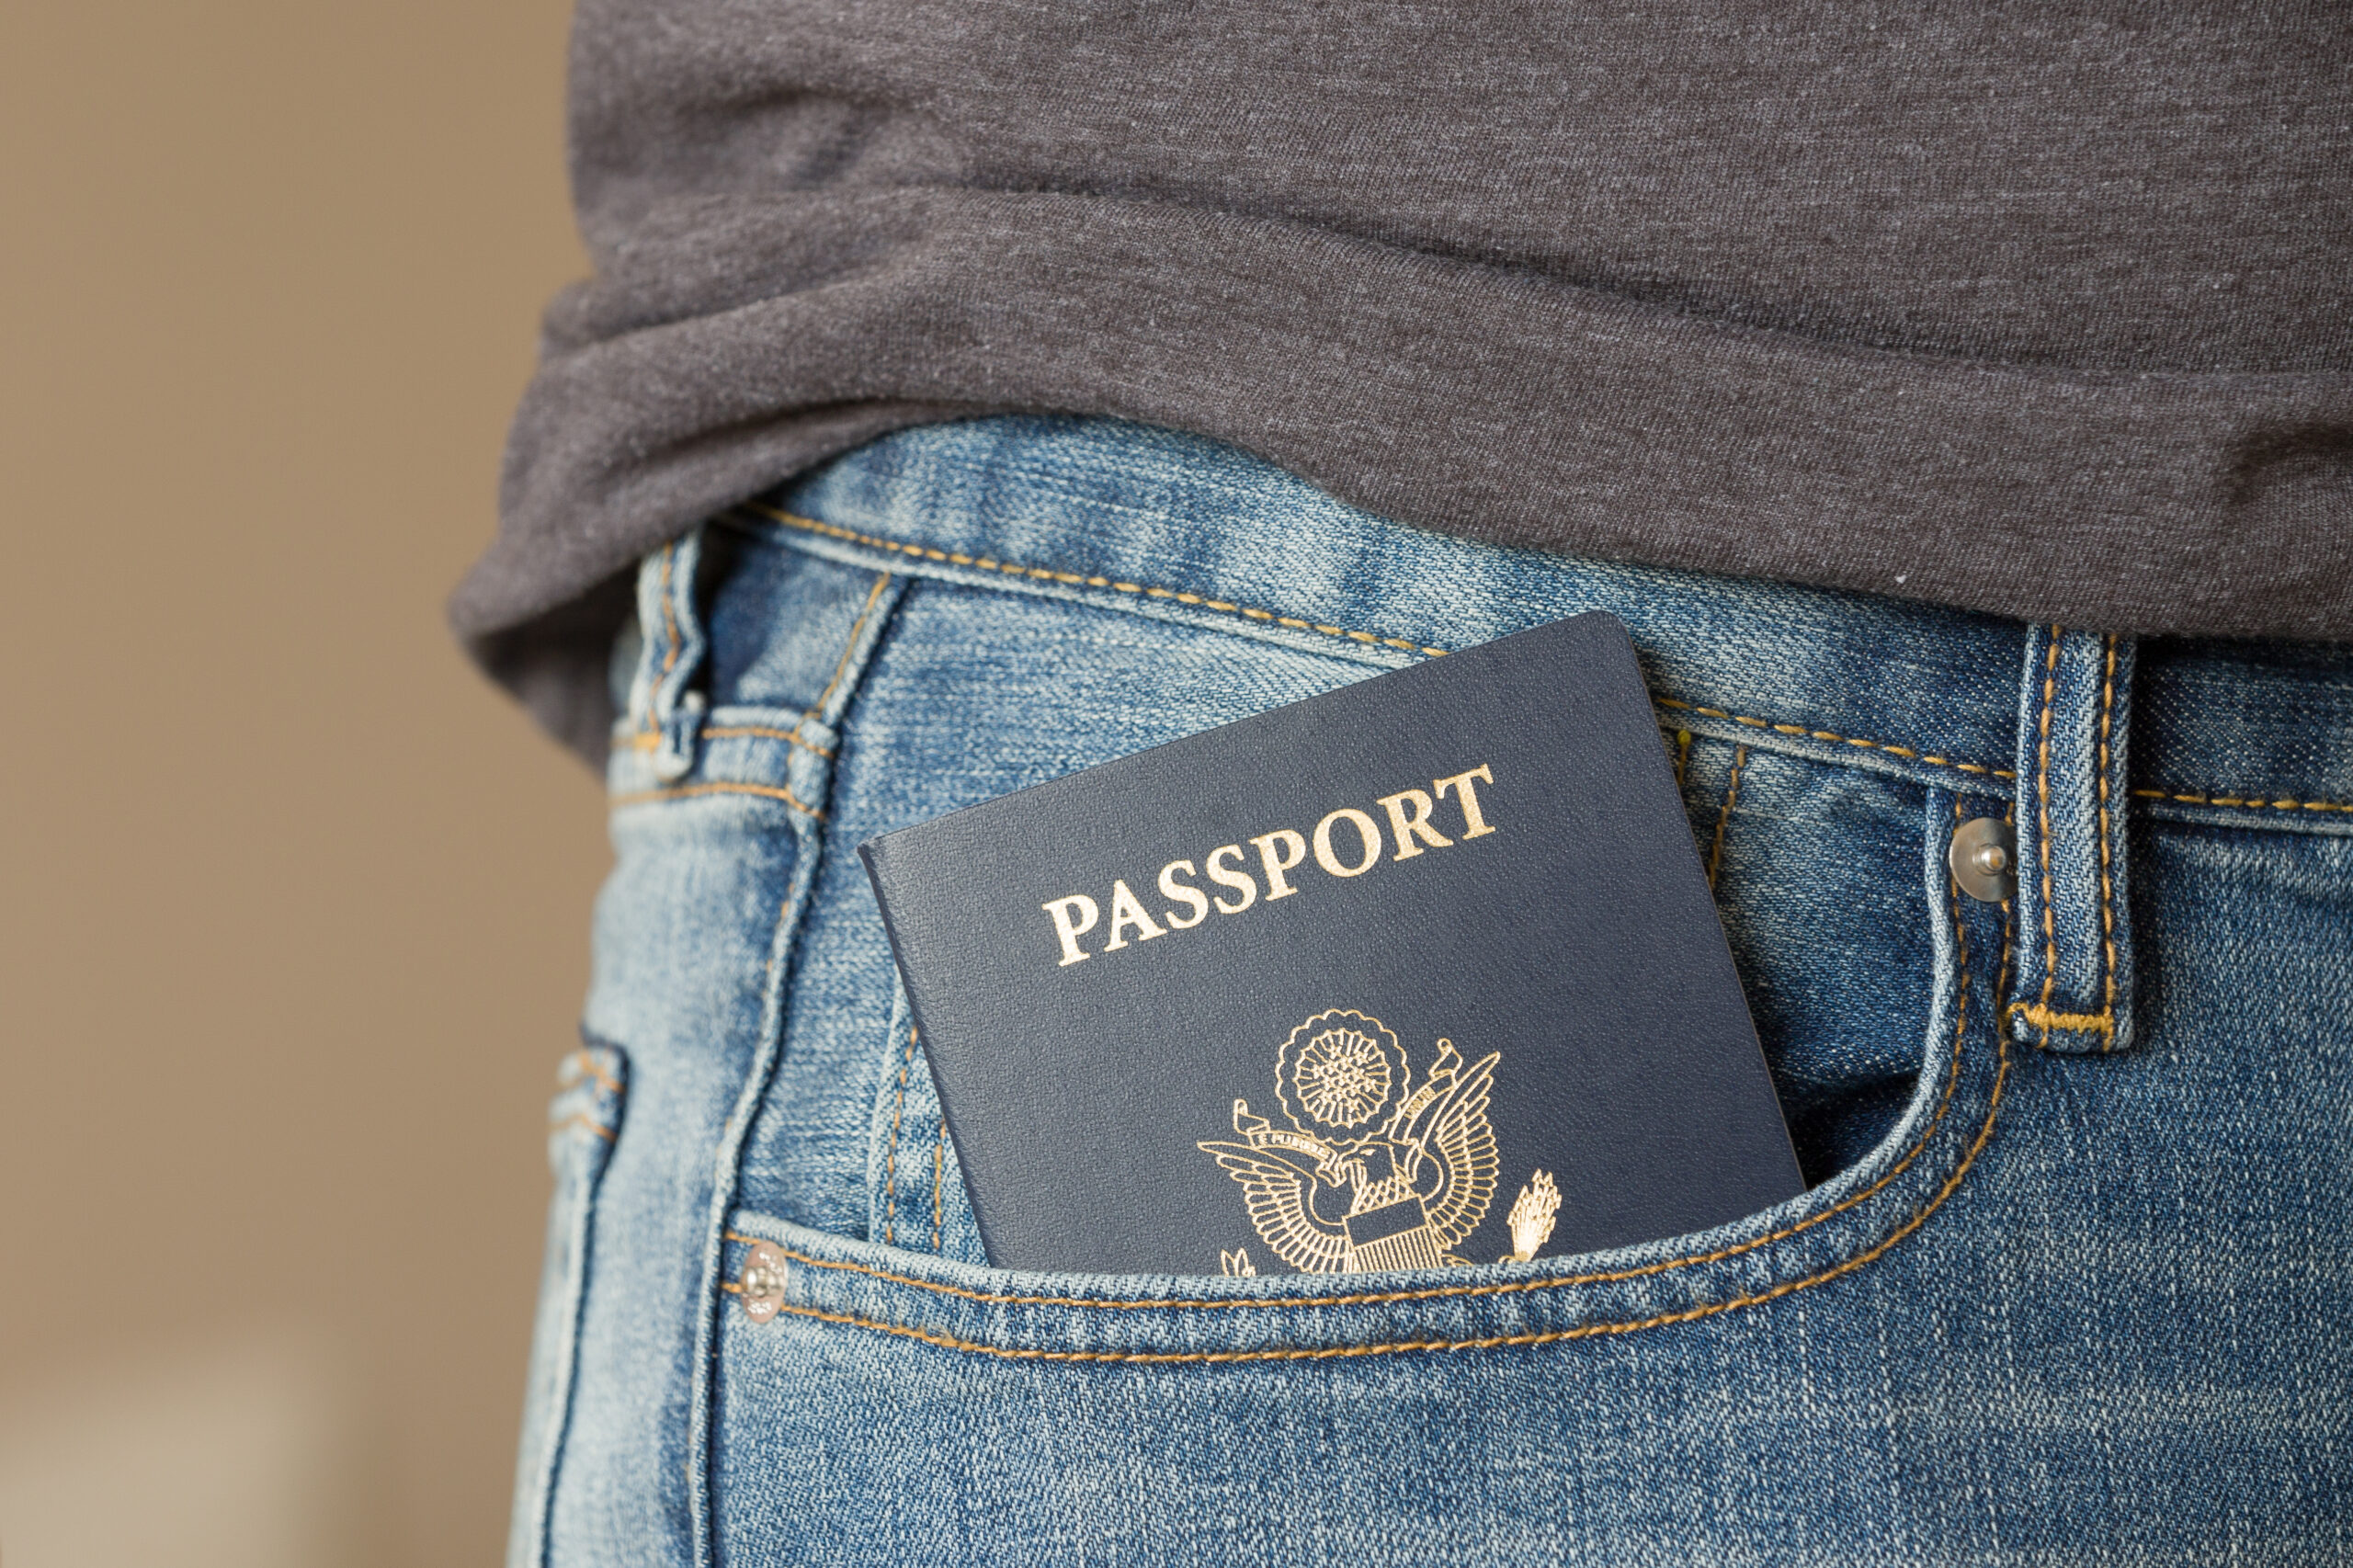 Closeup of US passport in jeans pocket